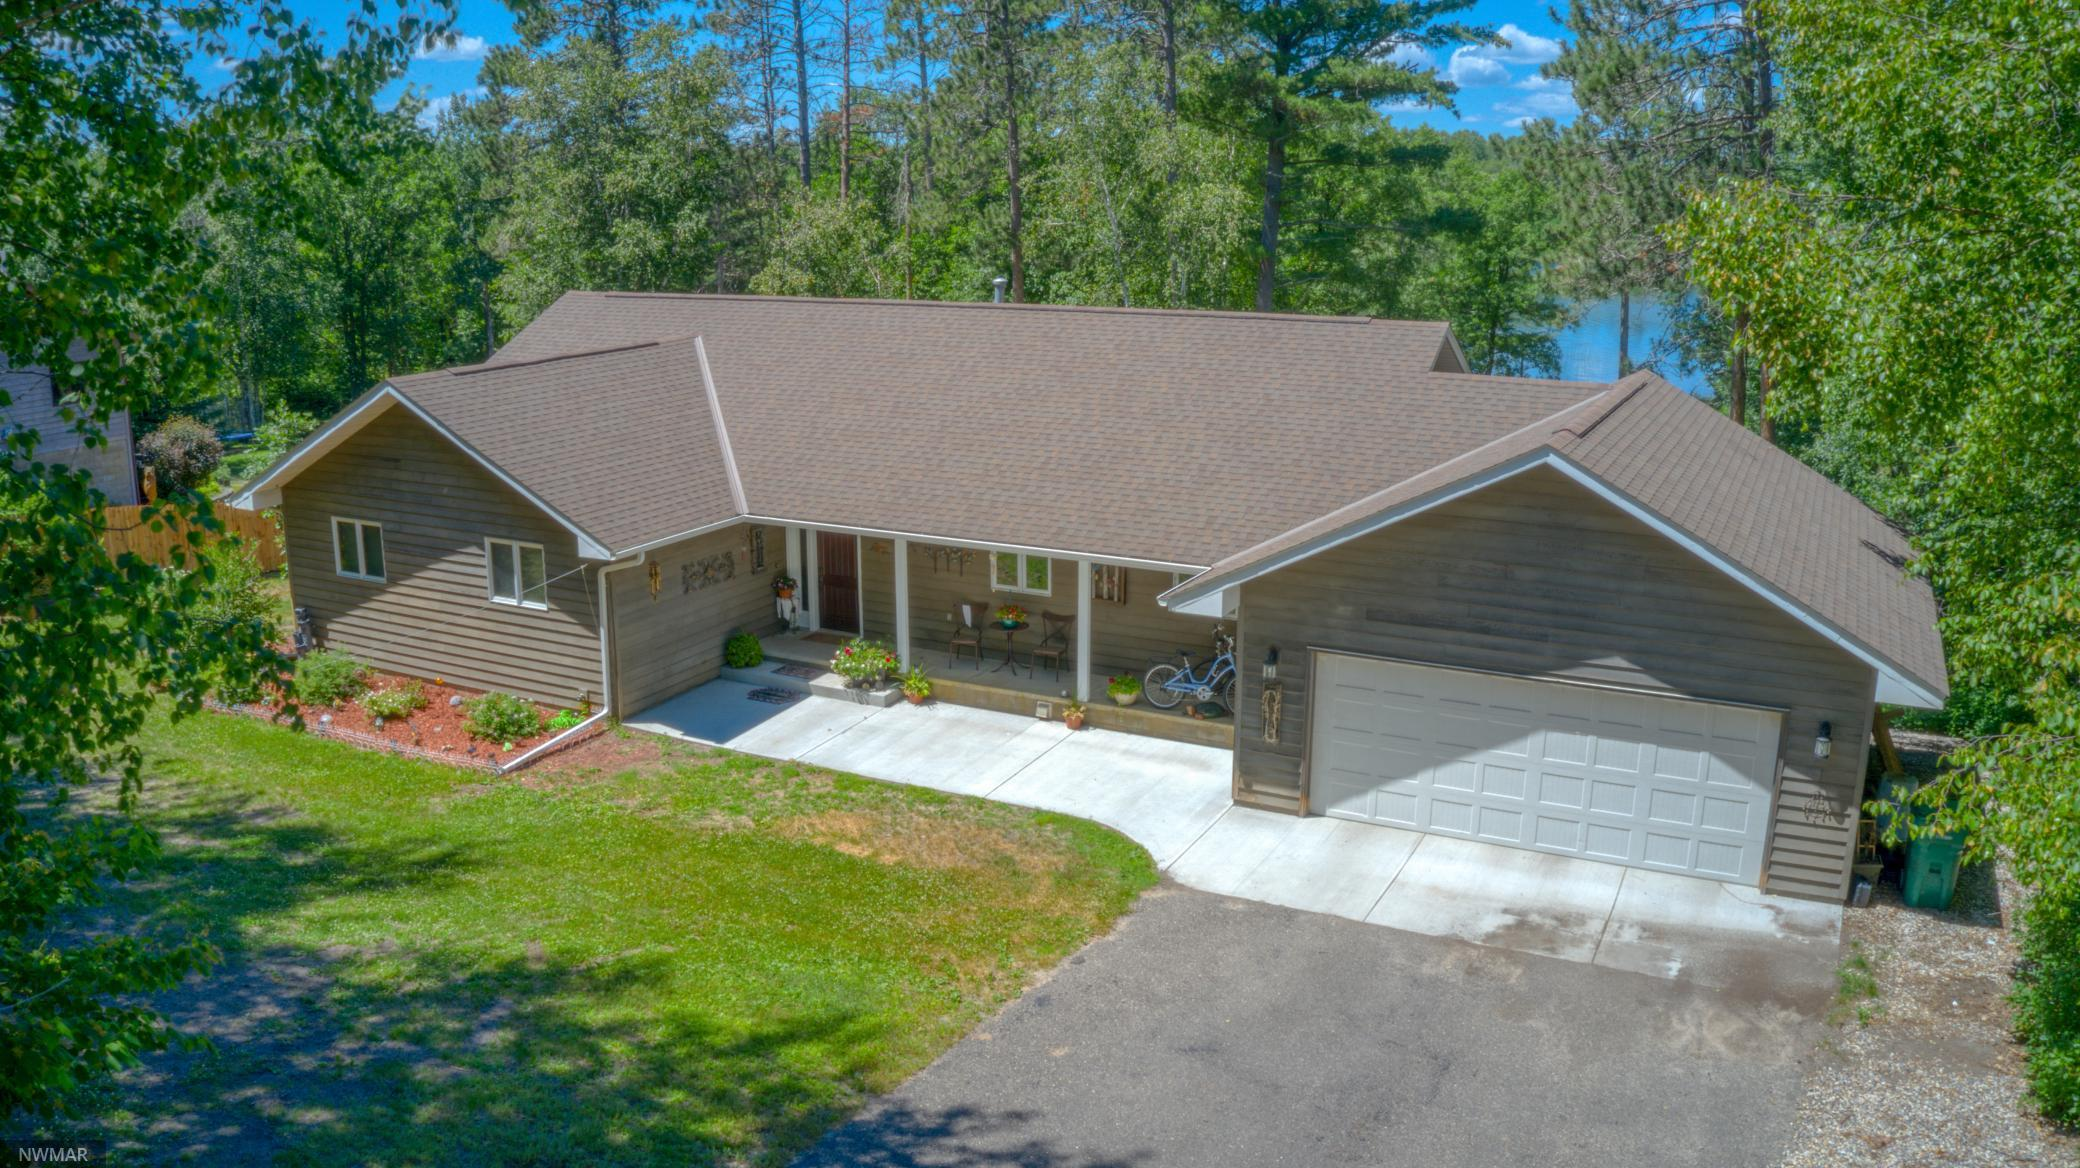 12327 Bay NE Property Photo - Bemidji, MN real estate listing